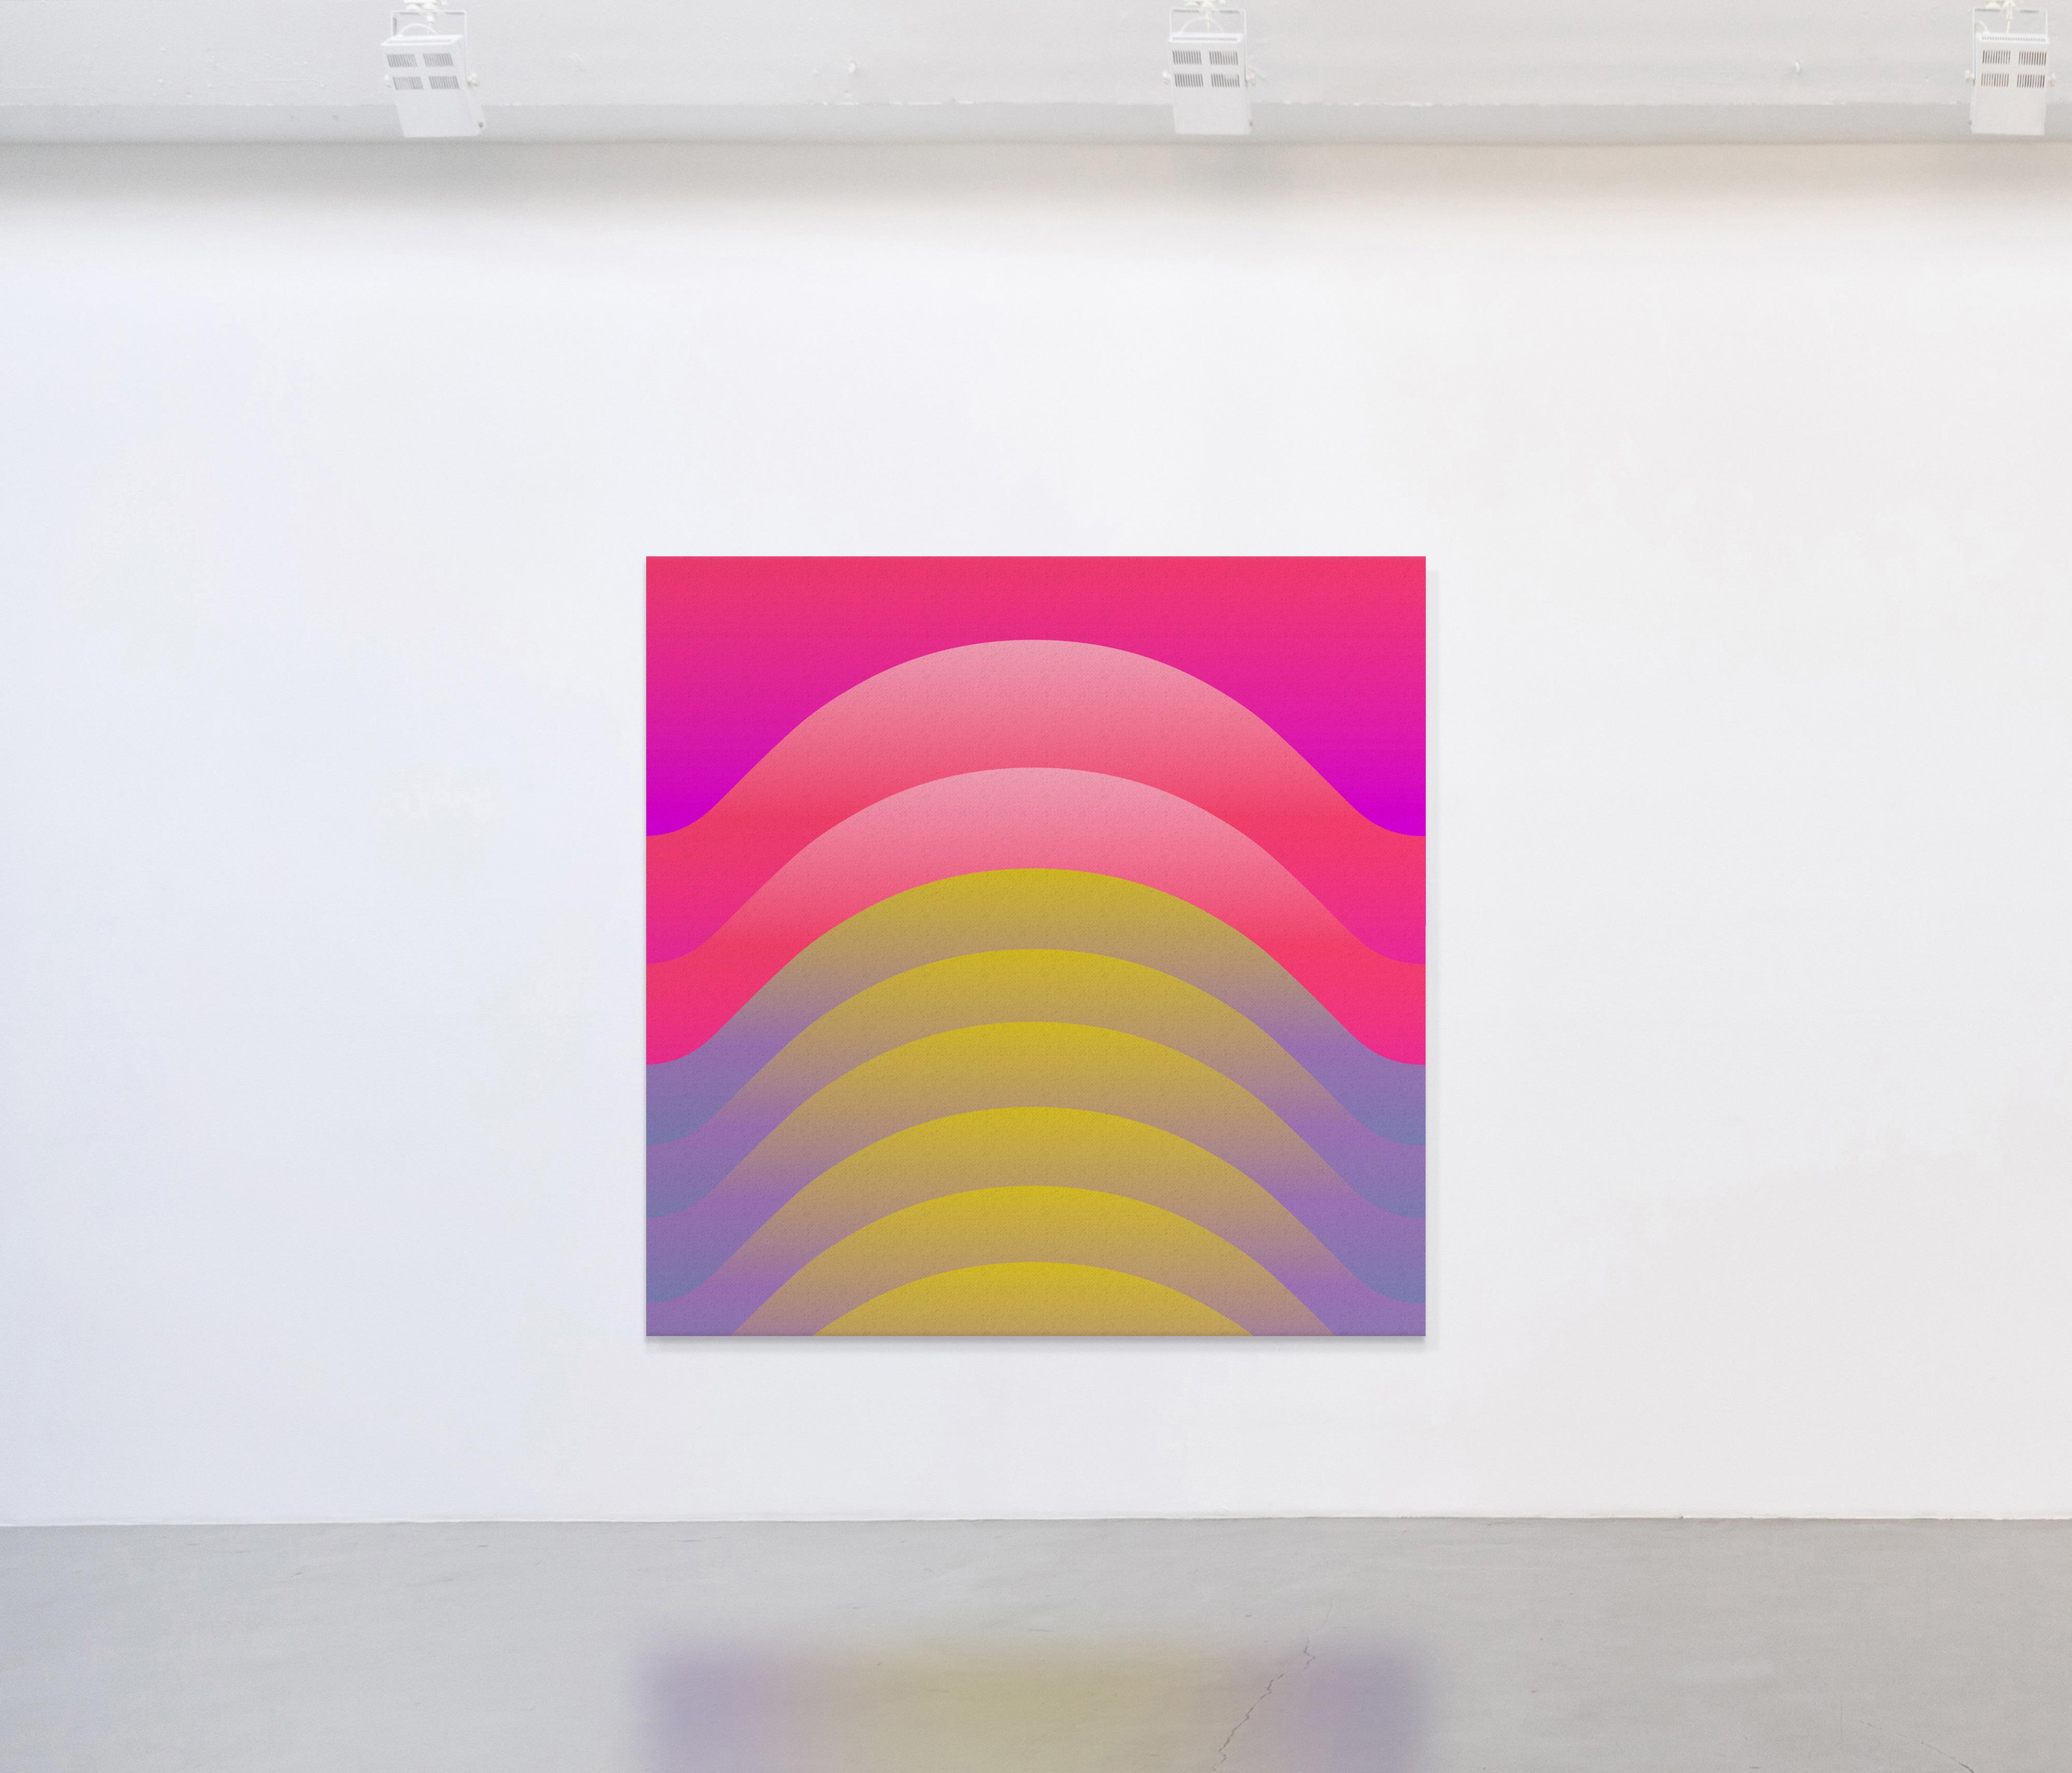 Galerie Barbara Thumm \ New Viewings \ New Viewings #14